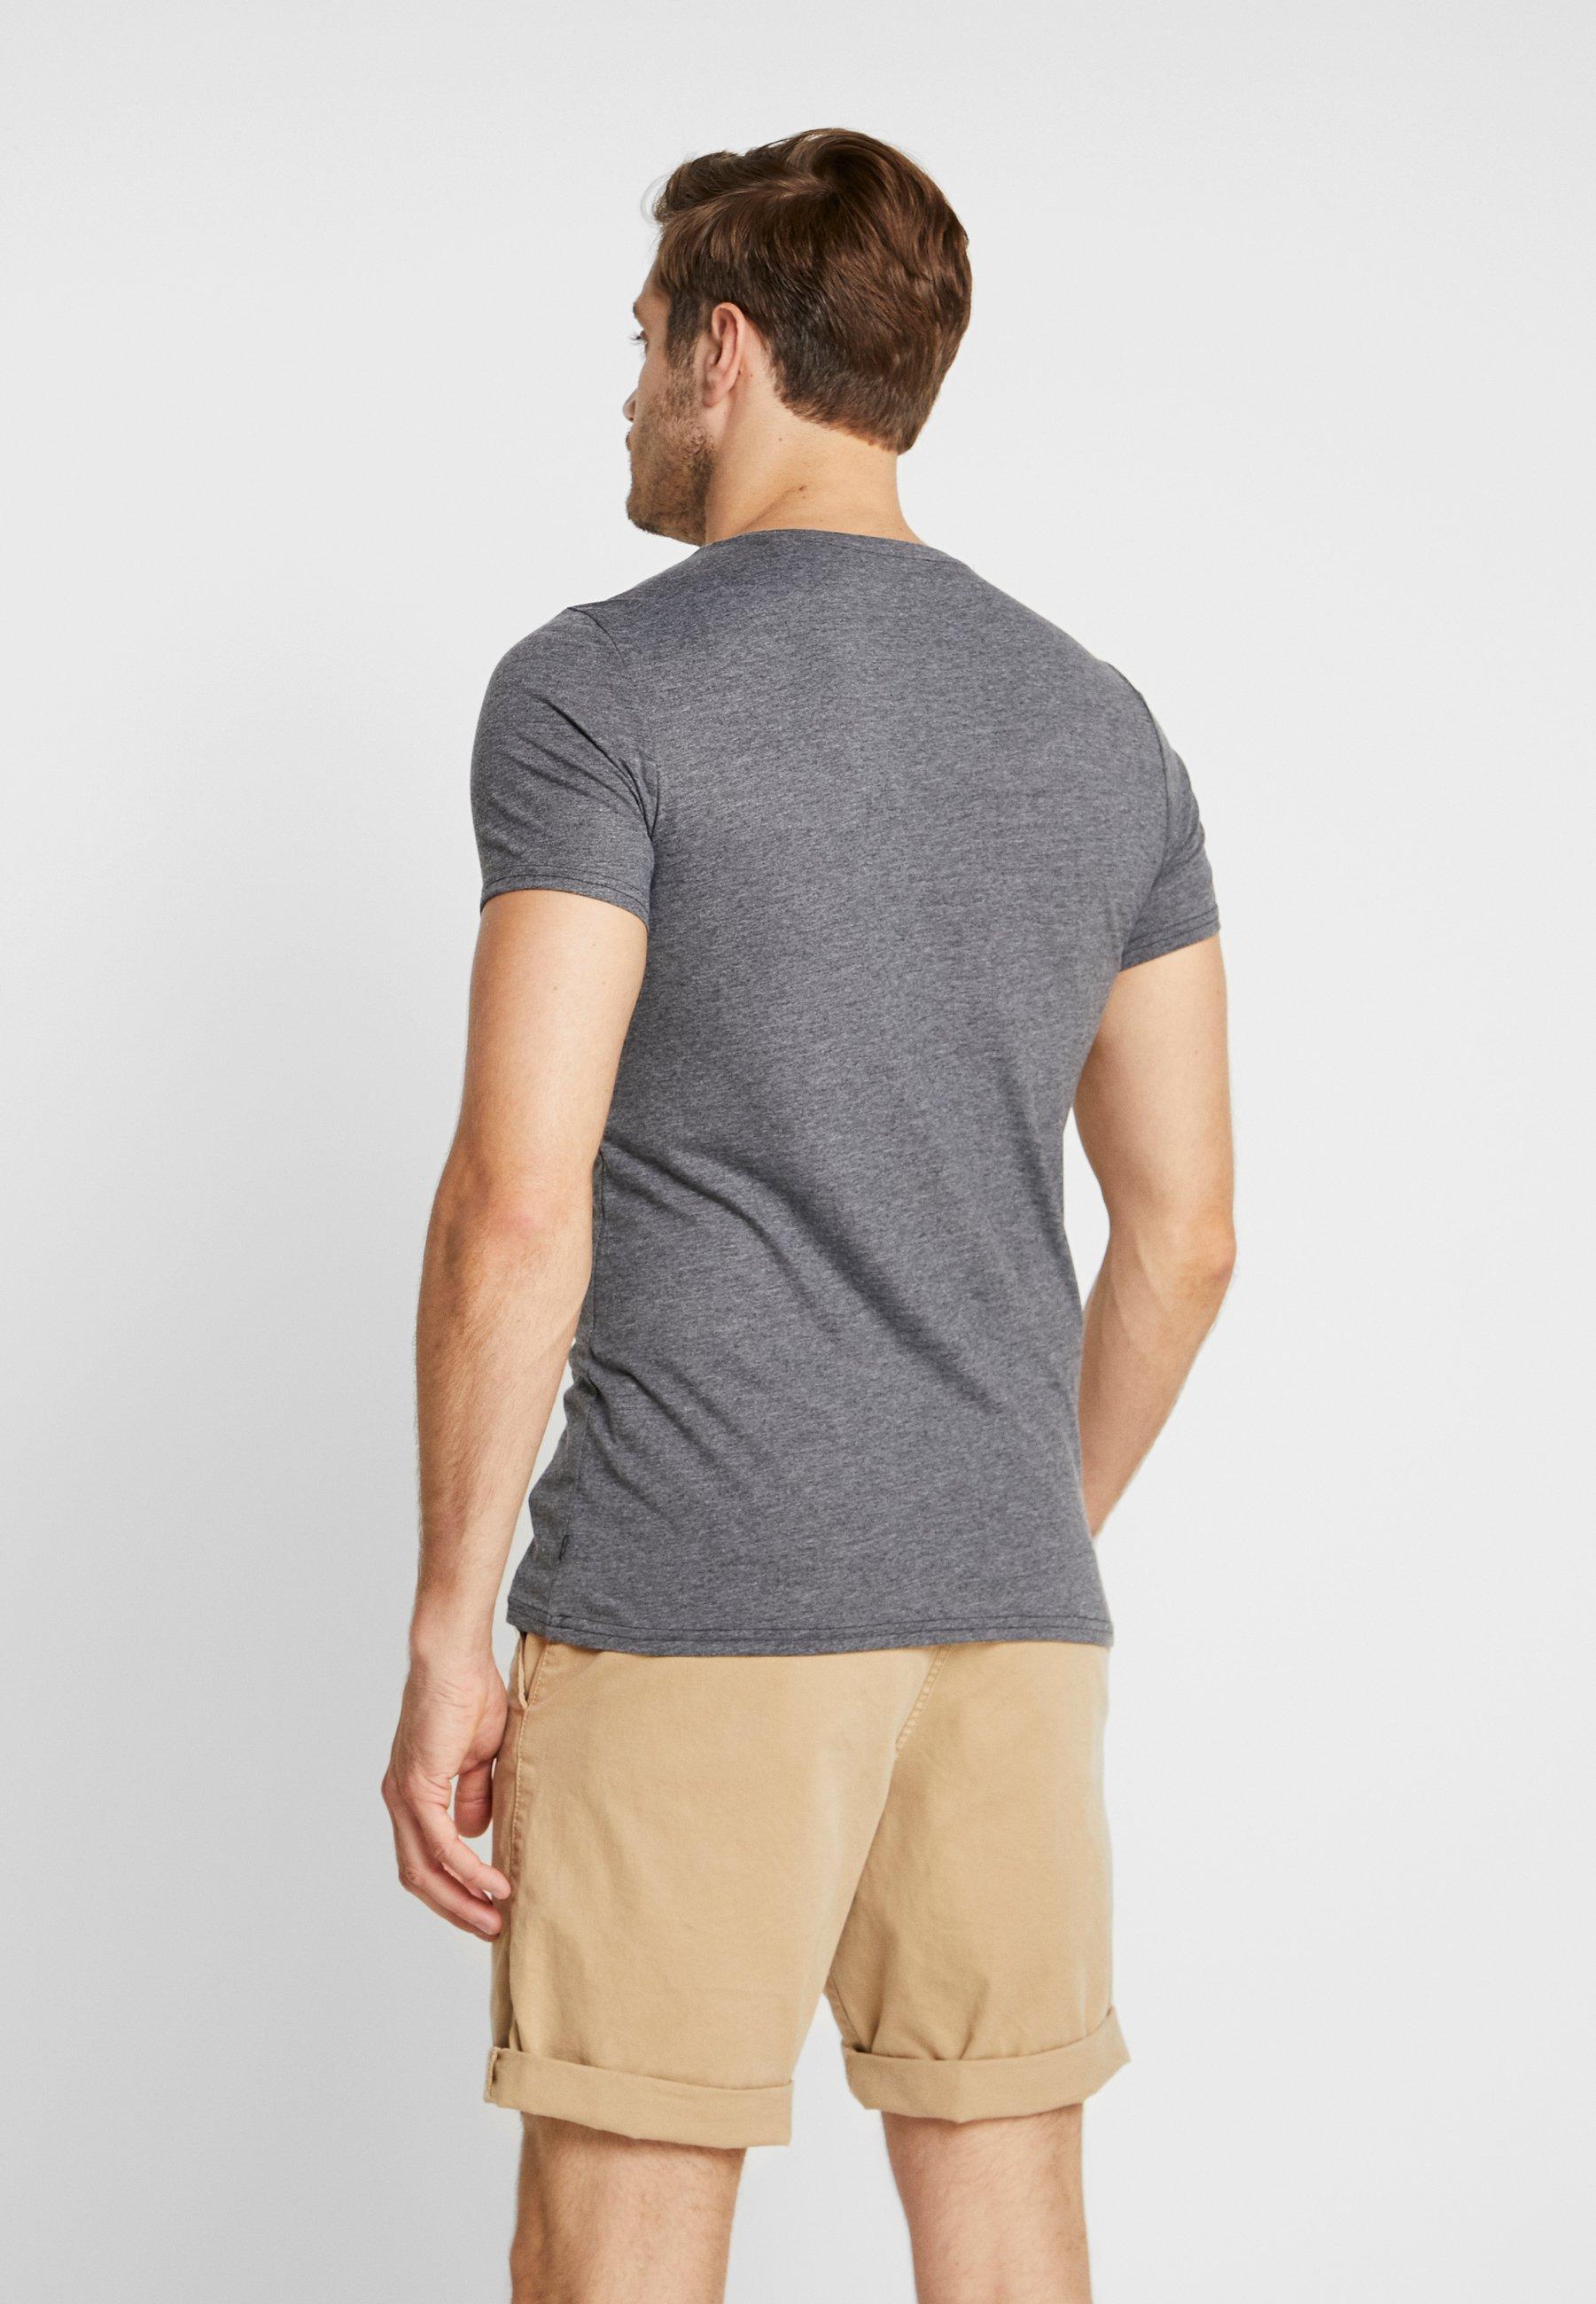 s Designed KurzarmT Q Grey Black shirt By Imprimé YbE9WDH2eI